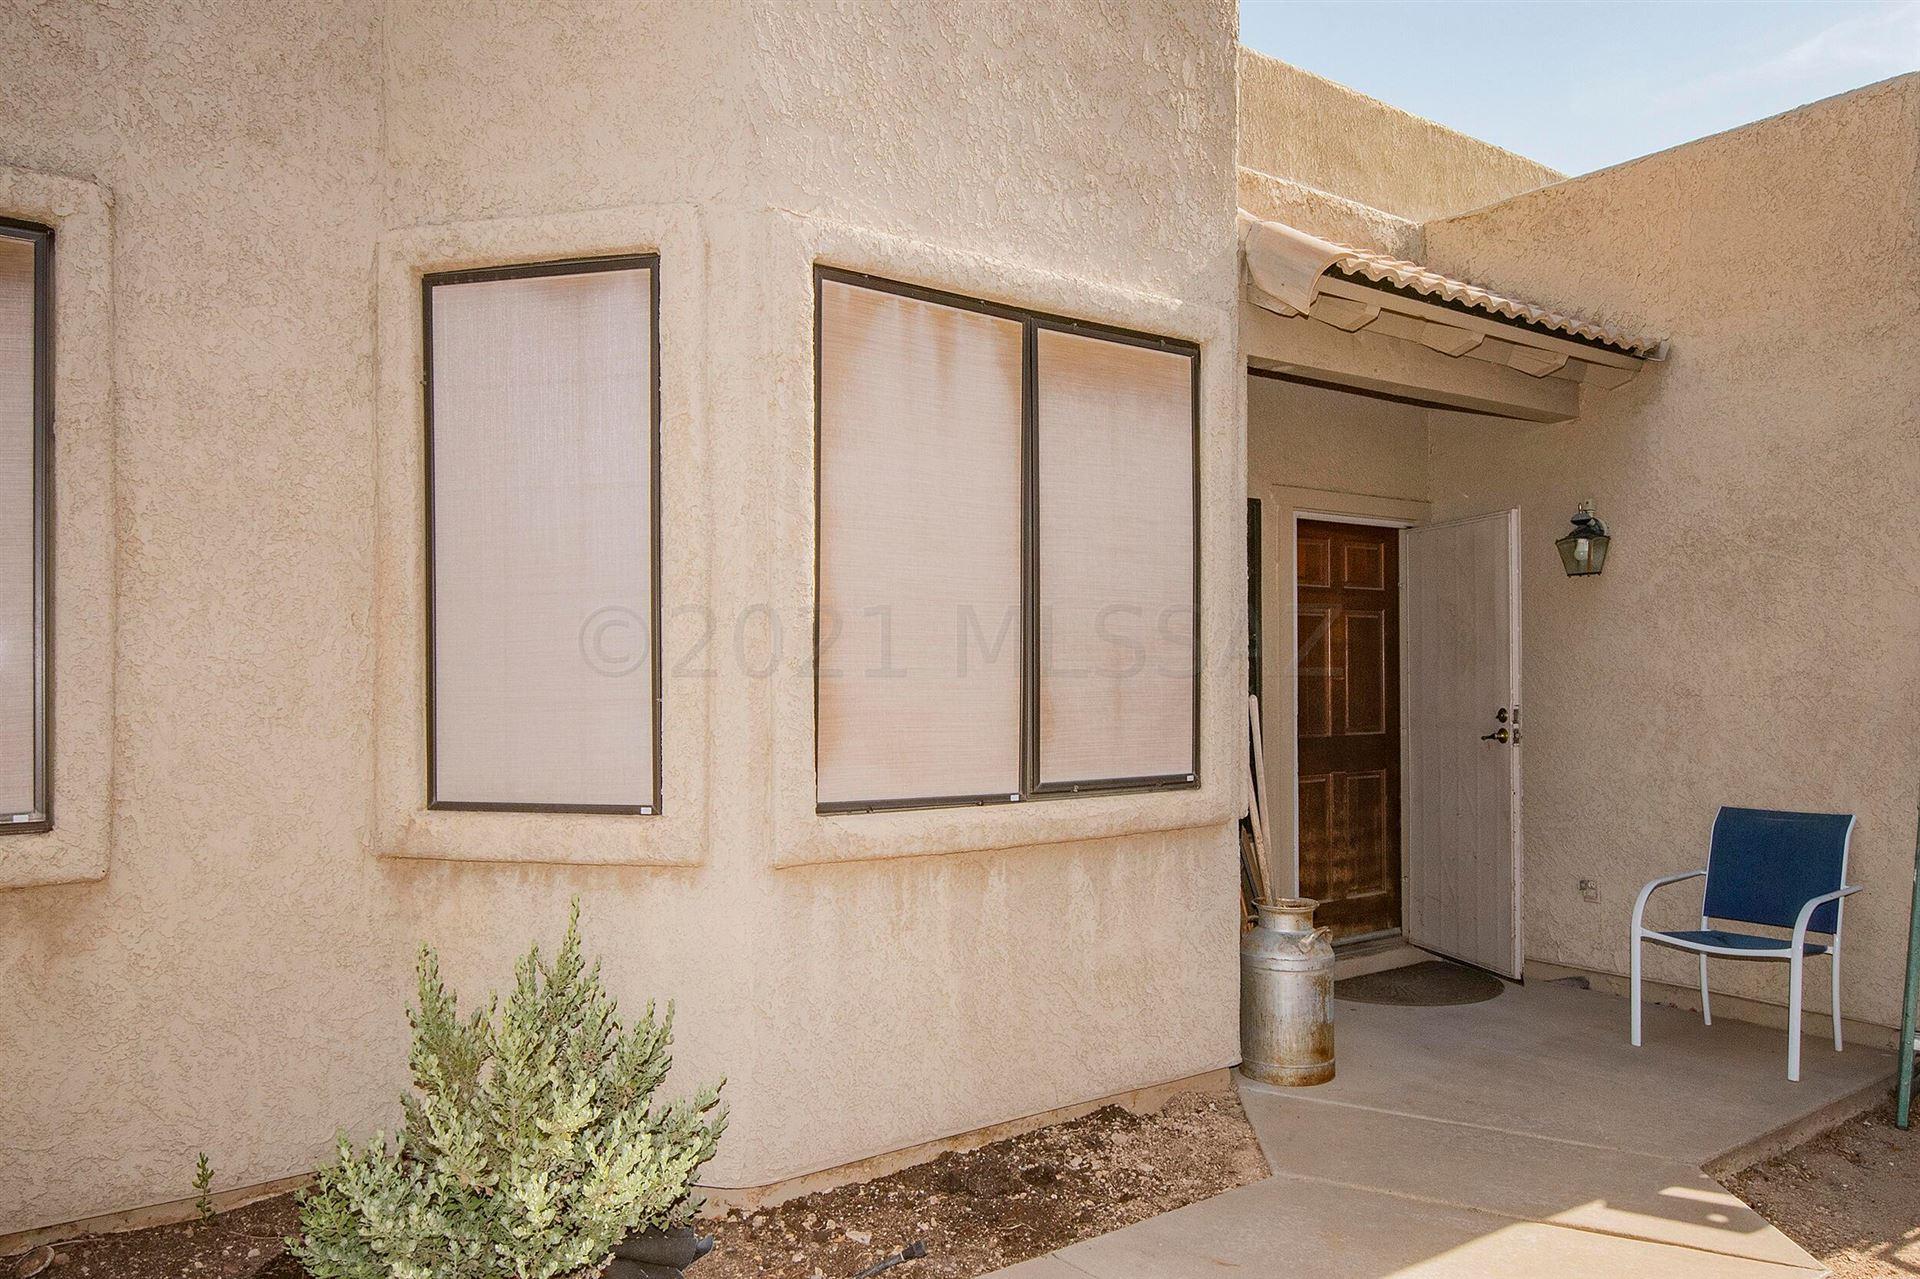 124 N CHAMPAGNE Place, Tucson, AZ 85745 - MLS#: 22115772